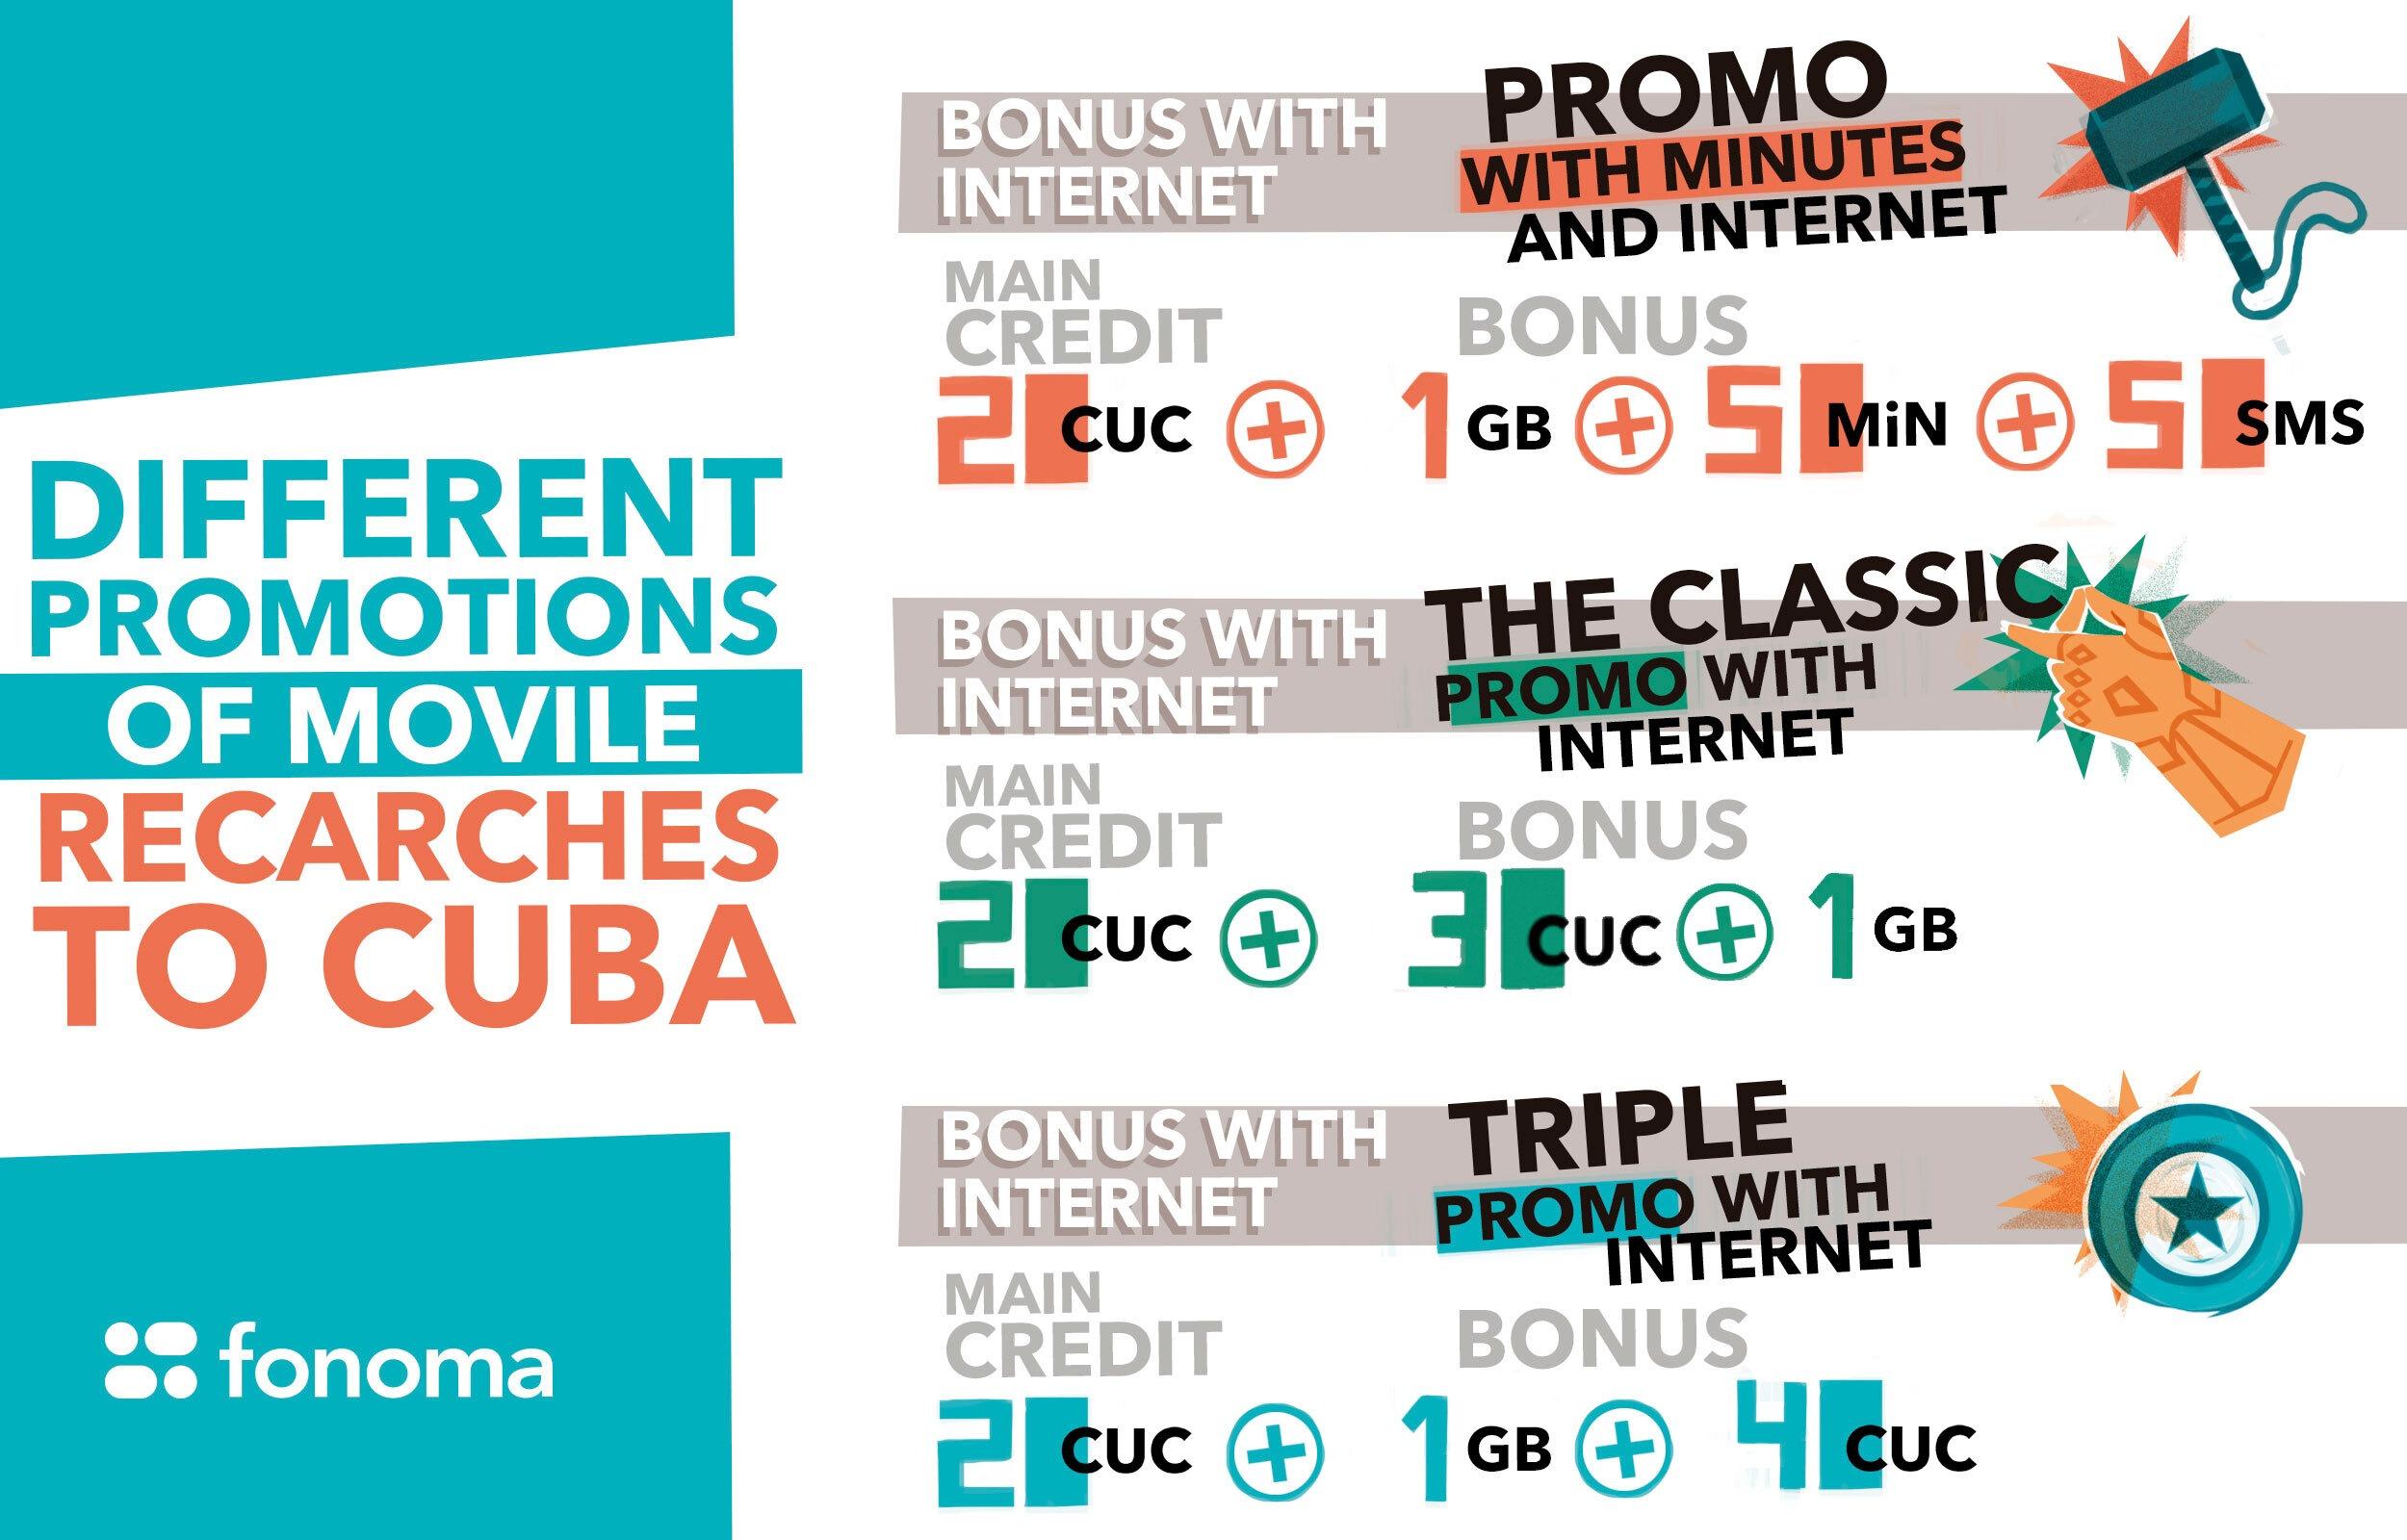 Bonuses with Internet